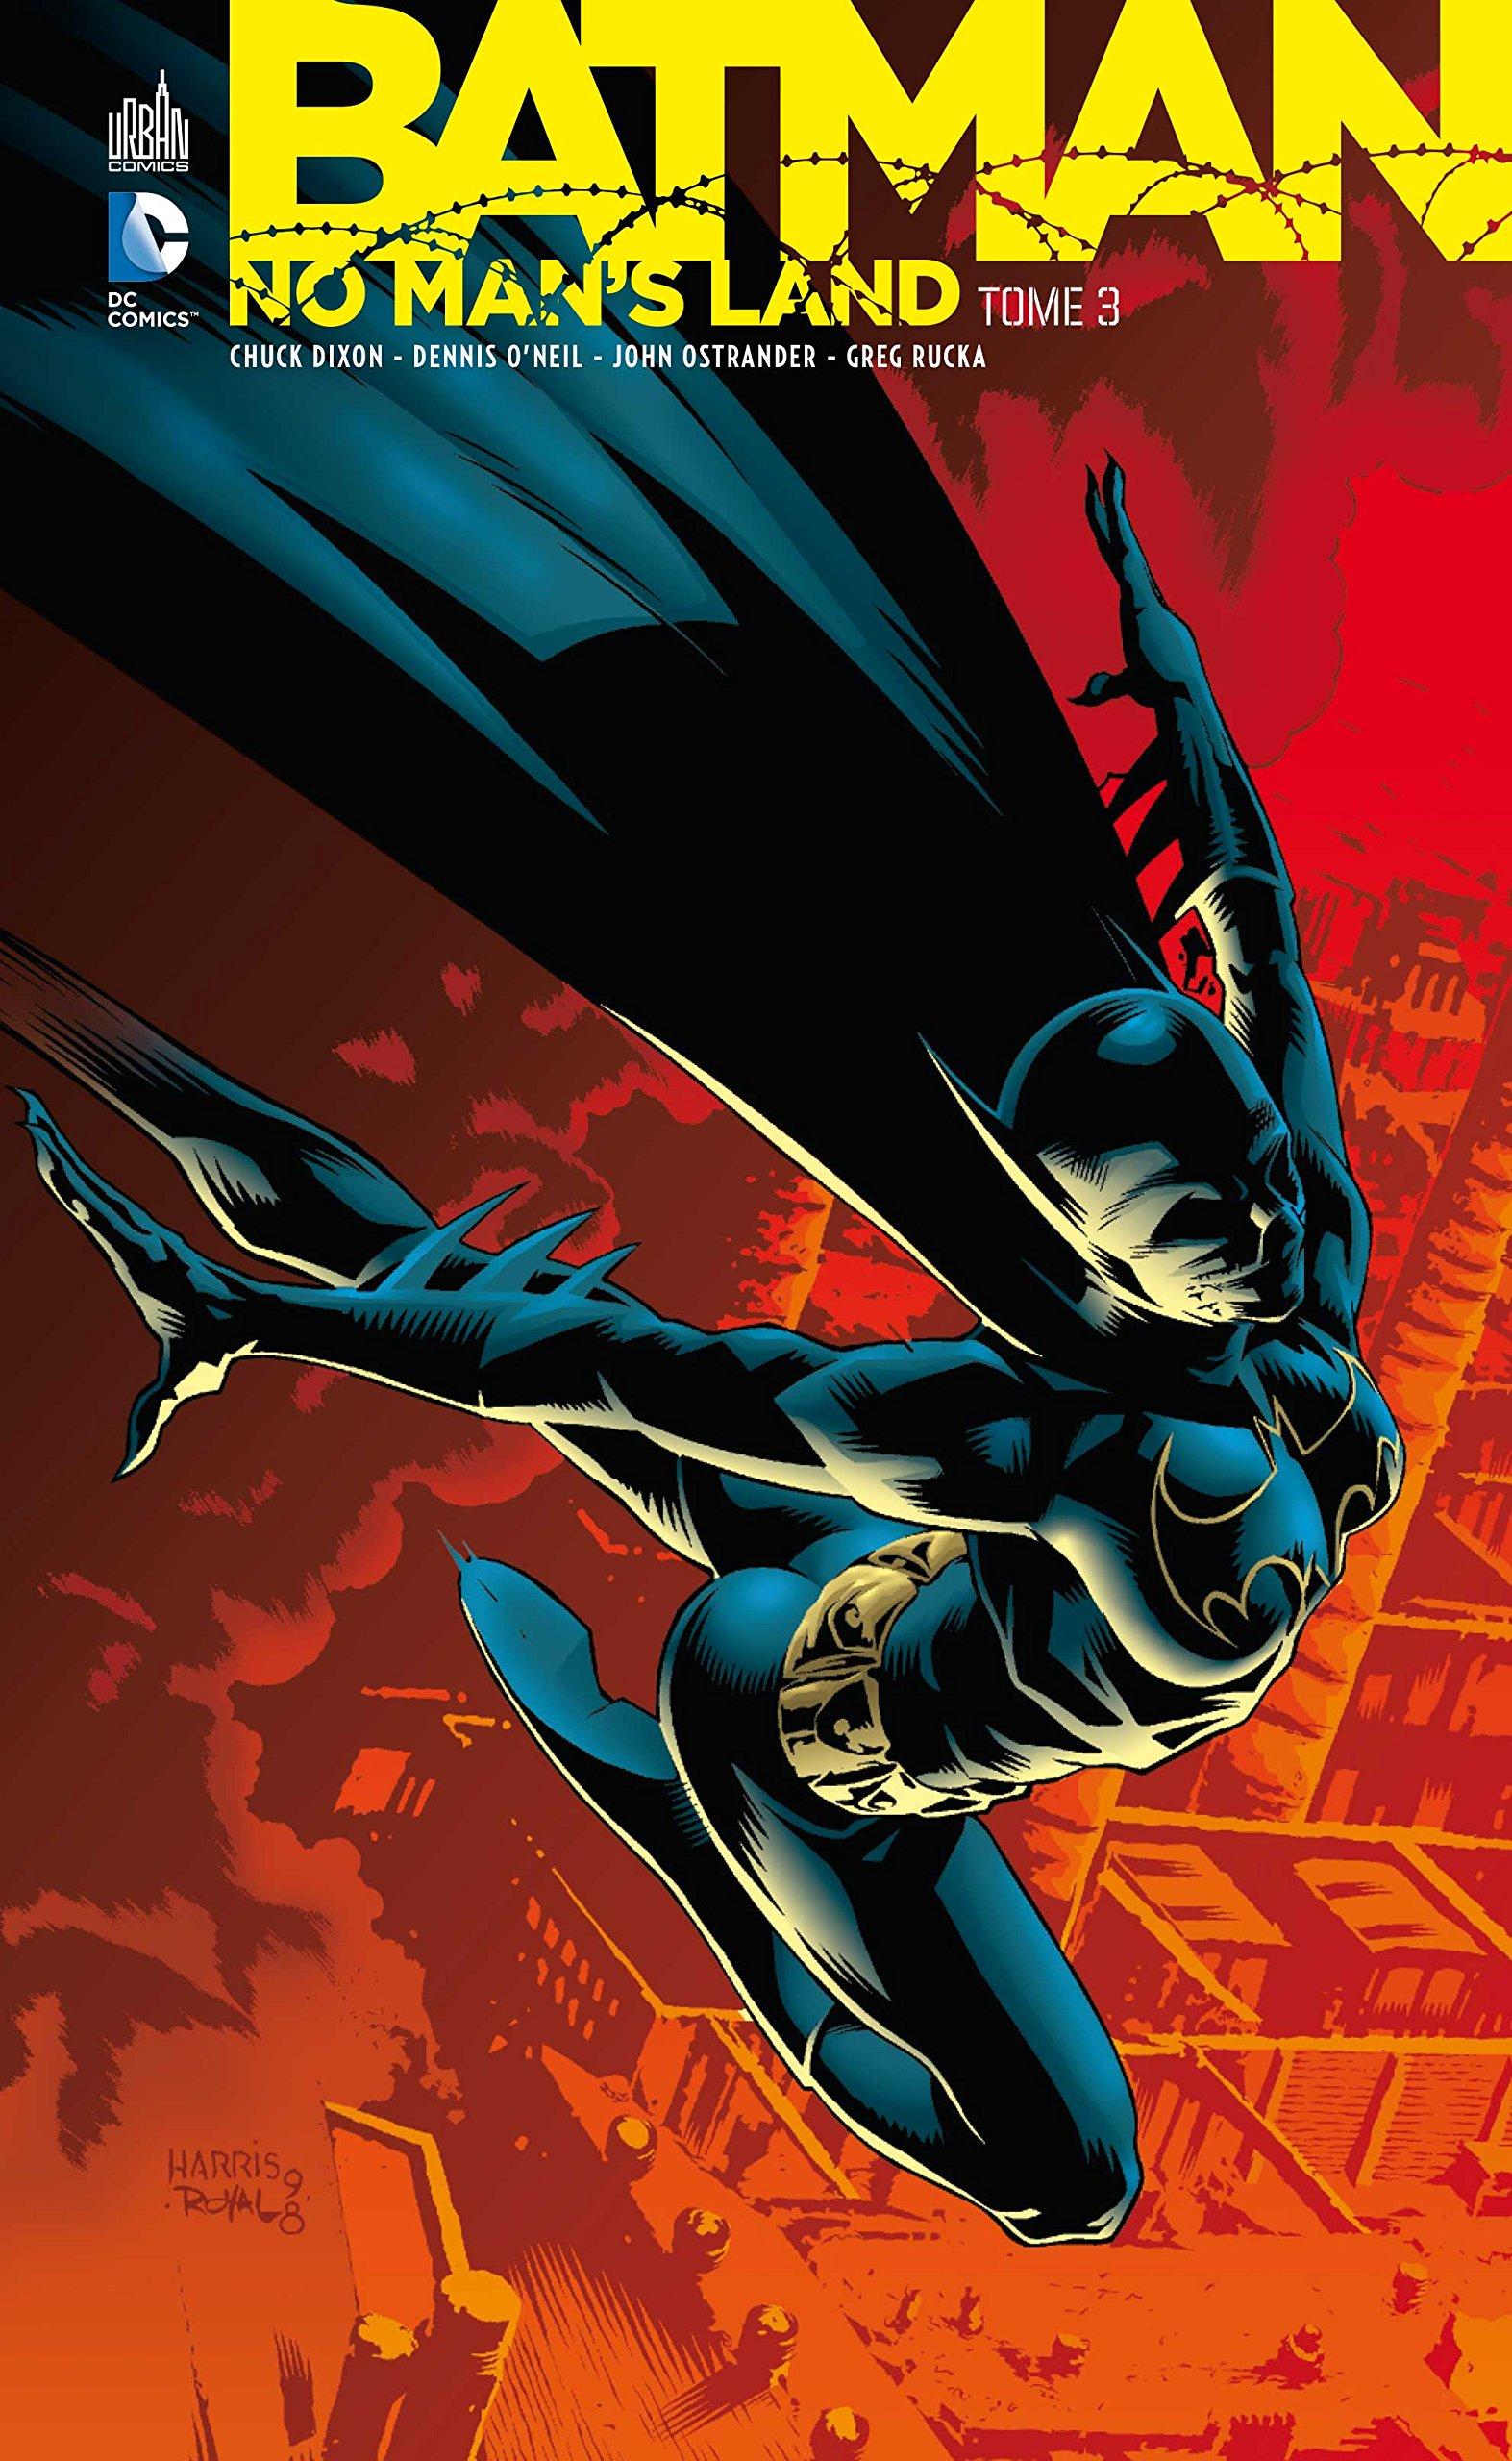 batman scan vf